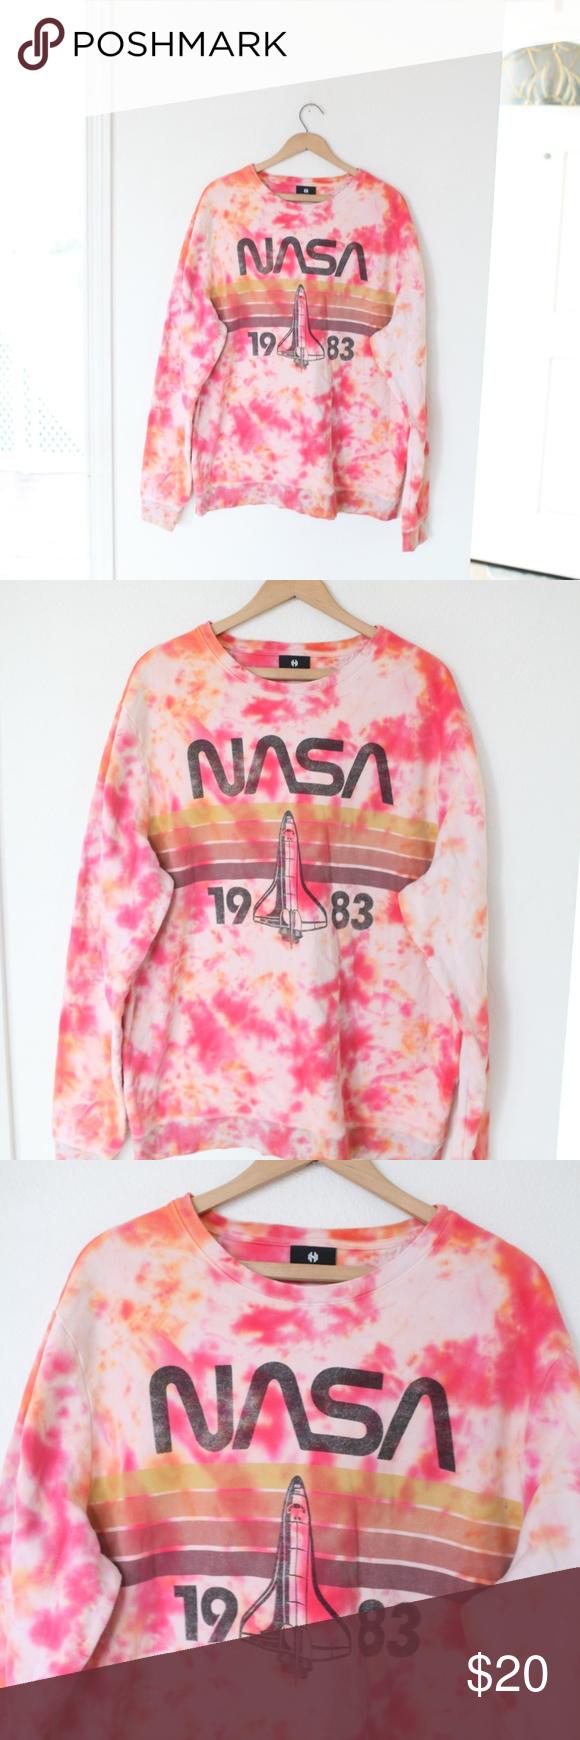 Hyper Space Nasa Tie Dye Sweatshirt Mens Xl Tie Dye Sweatshirt Mens Sweatshirts Sweatshirts [ 1740 x 580 Pixel ]